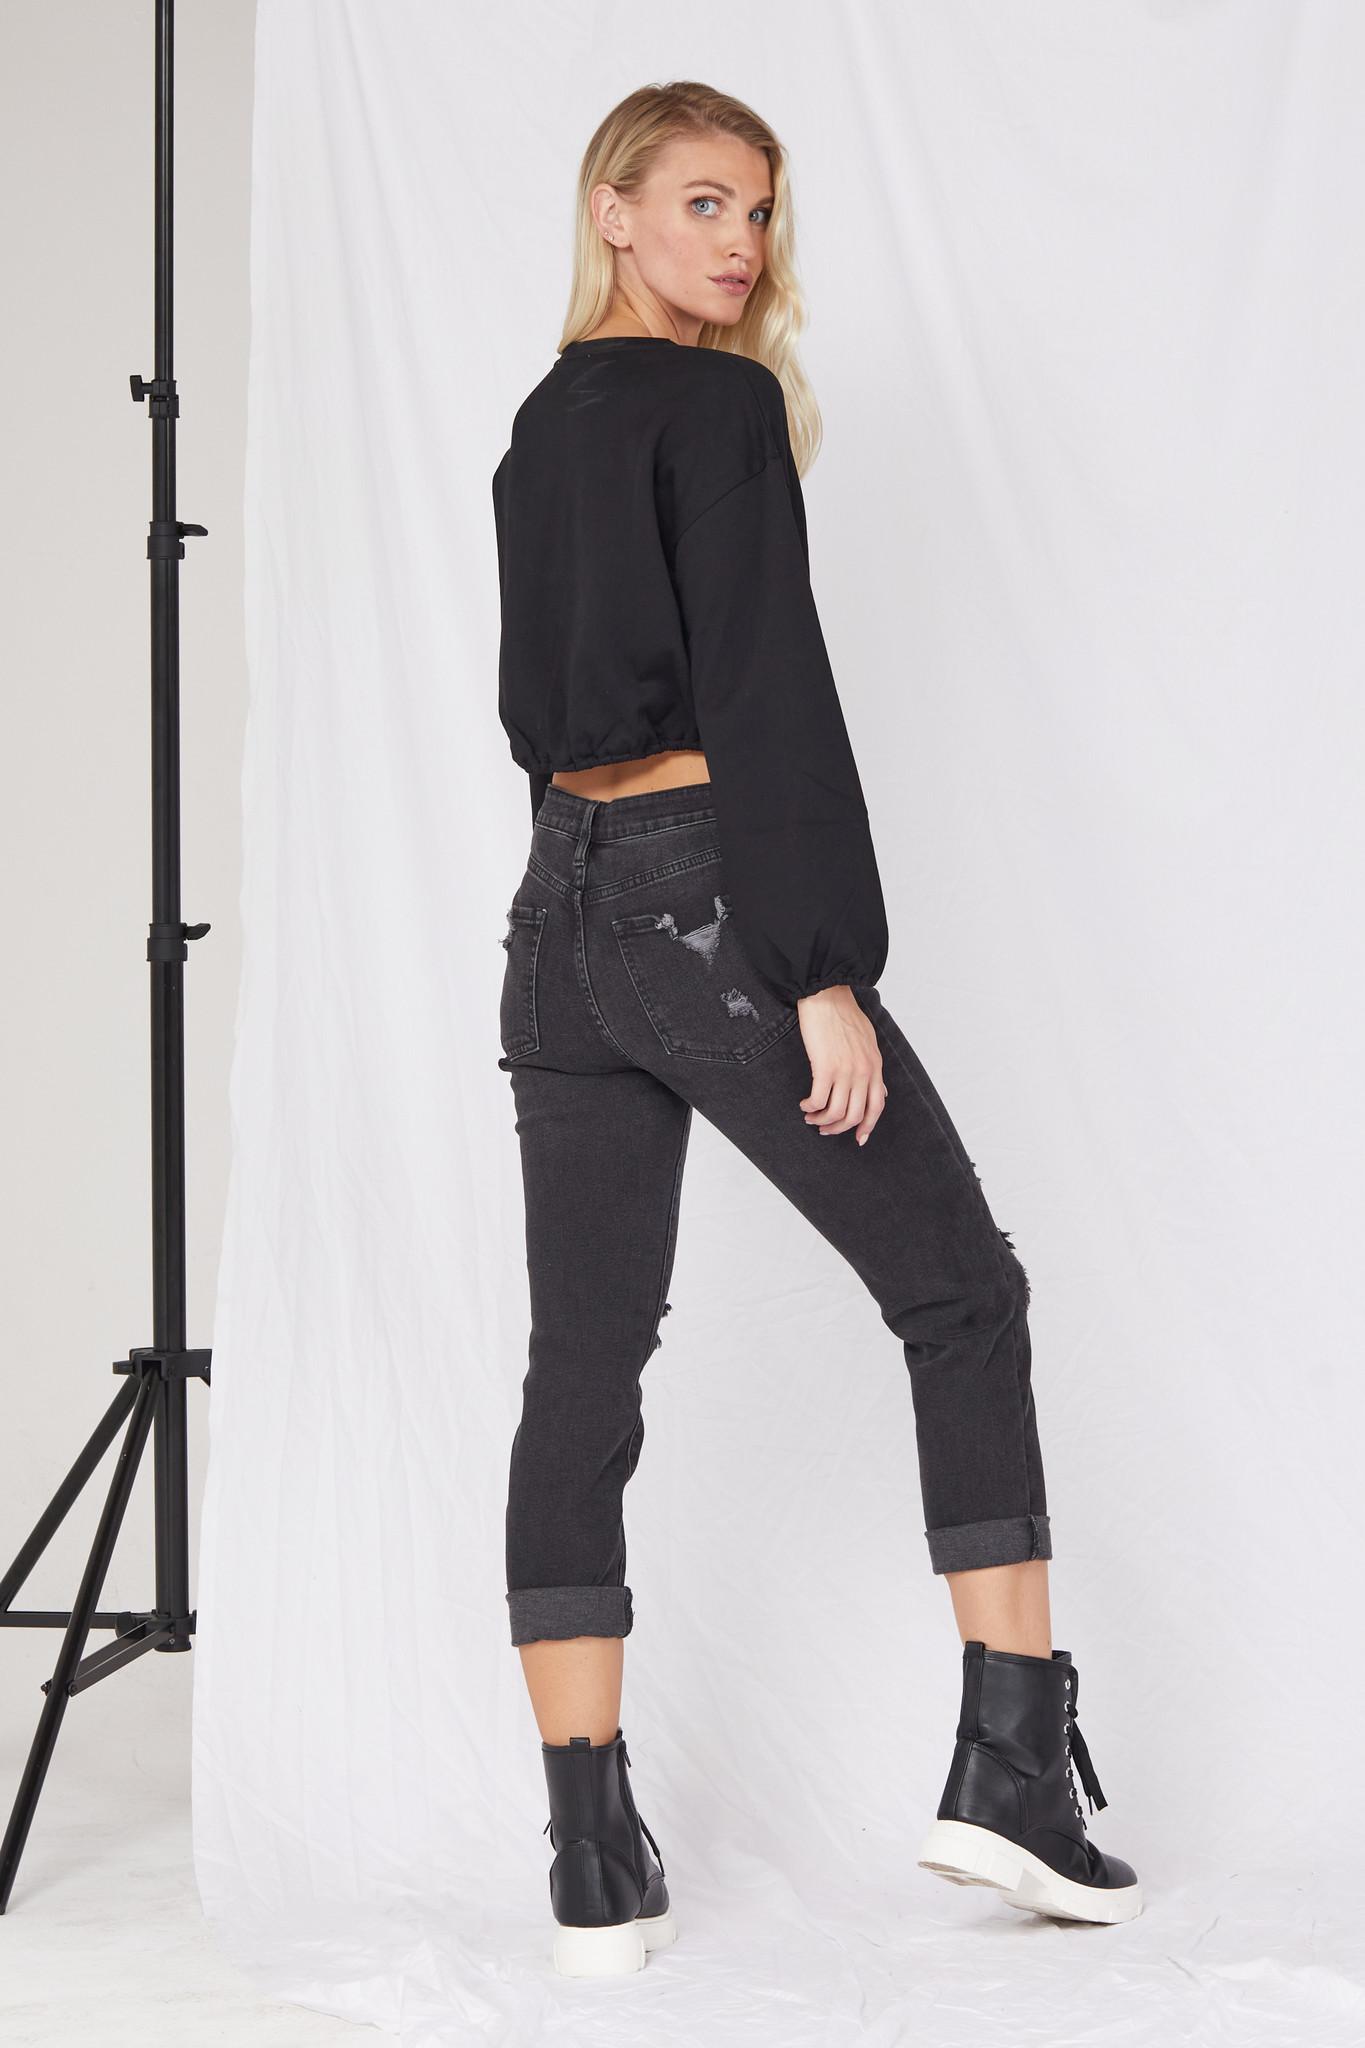 Sweatshirt Chill Out Black Sweatshirt